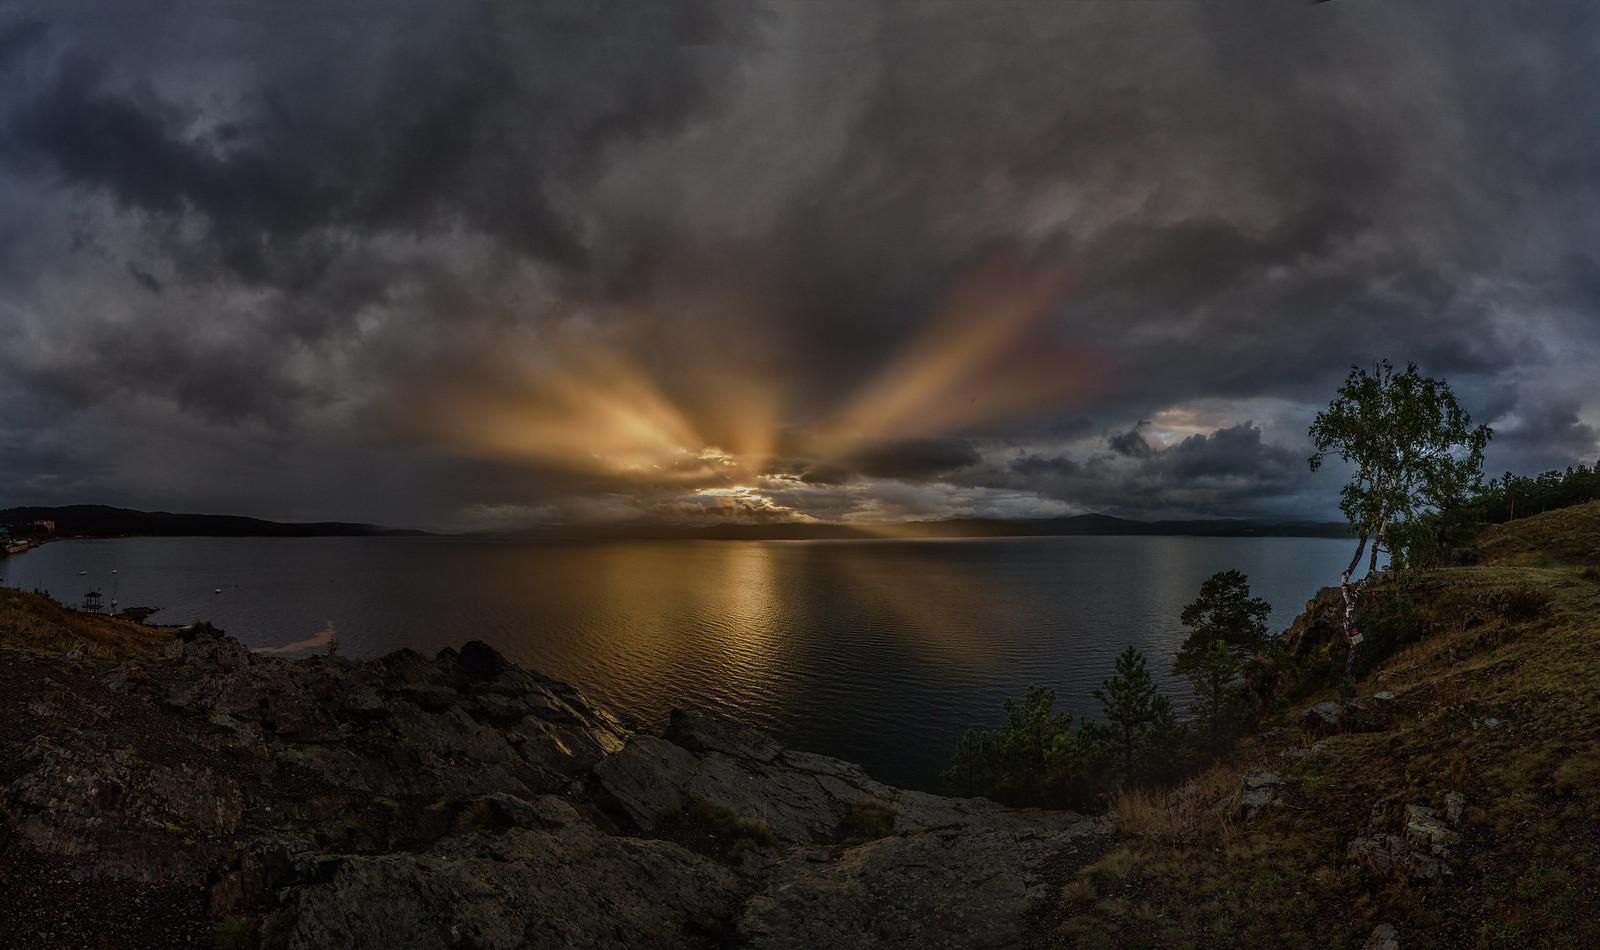 озеро Тургояк - фотограф Челябинск